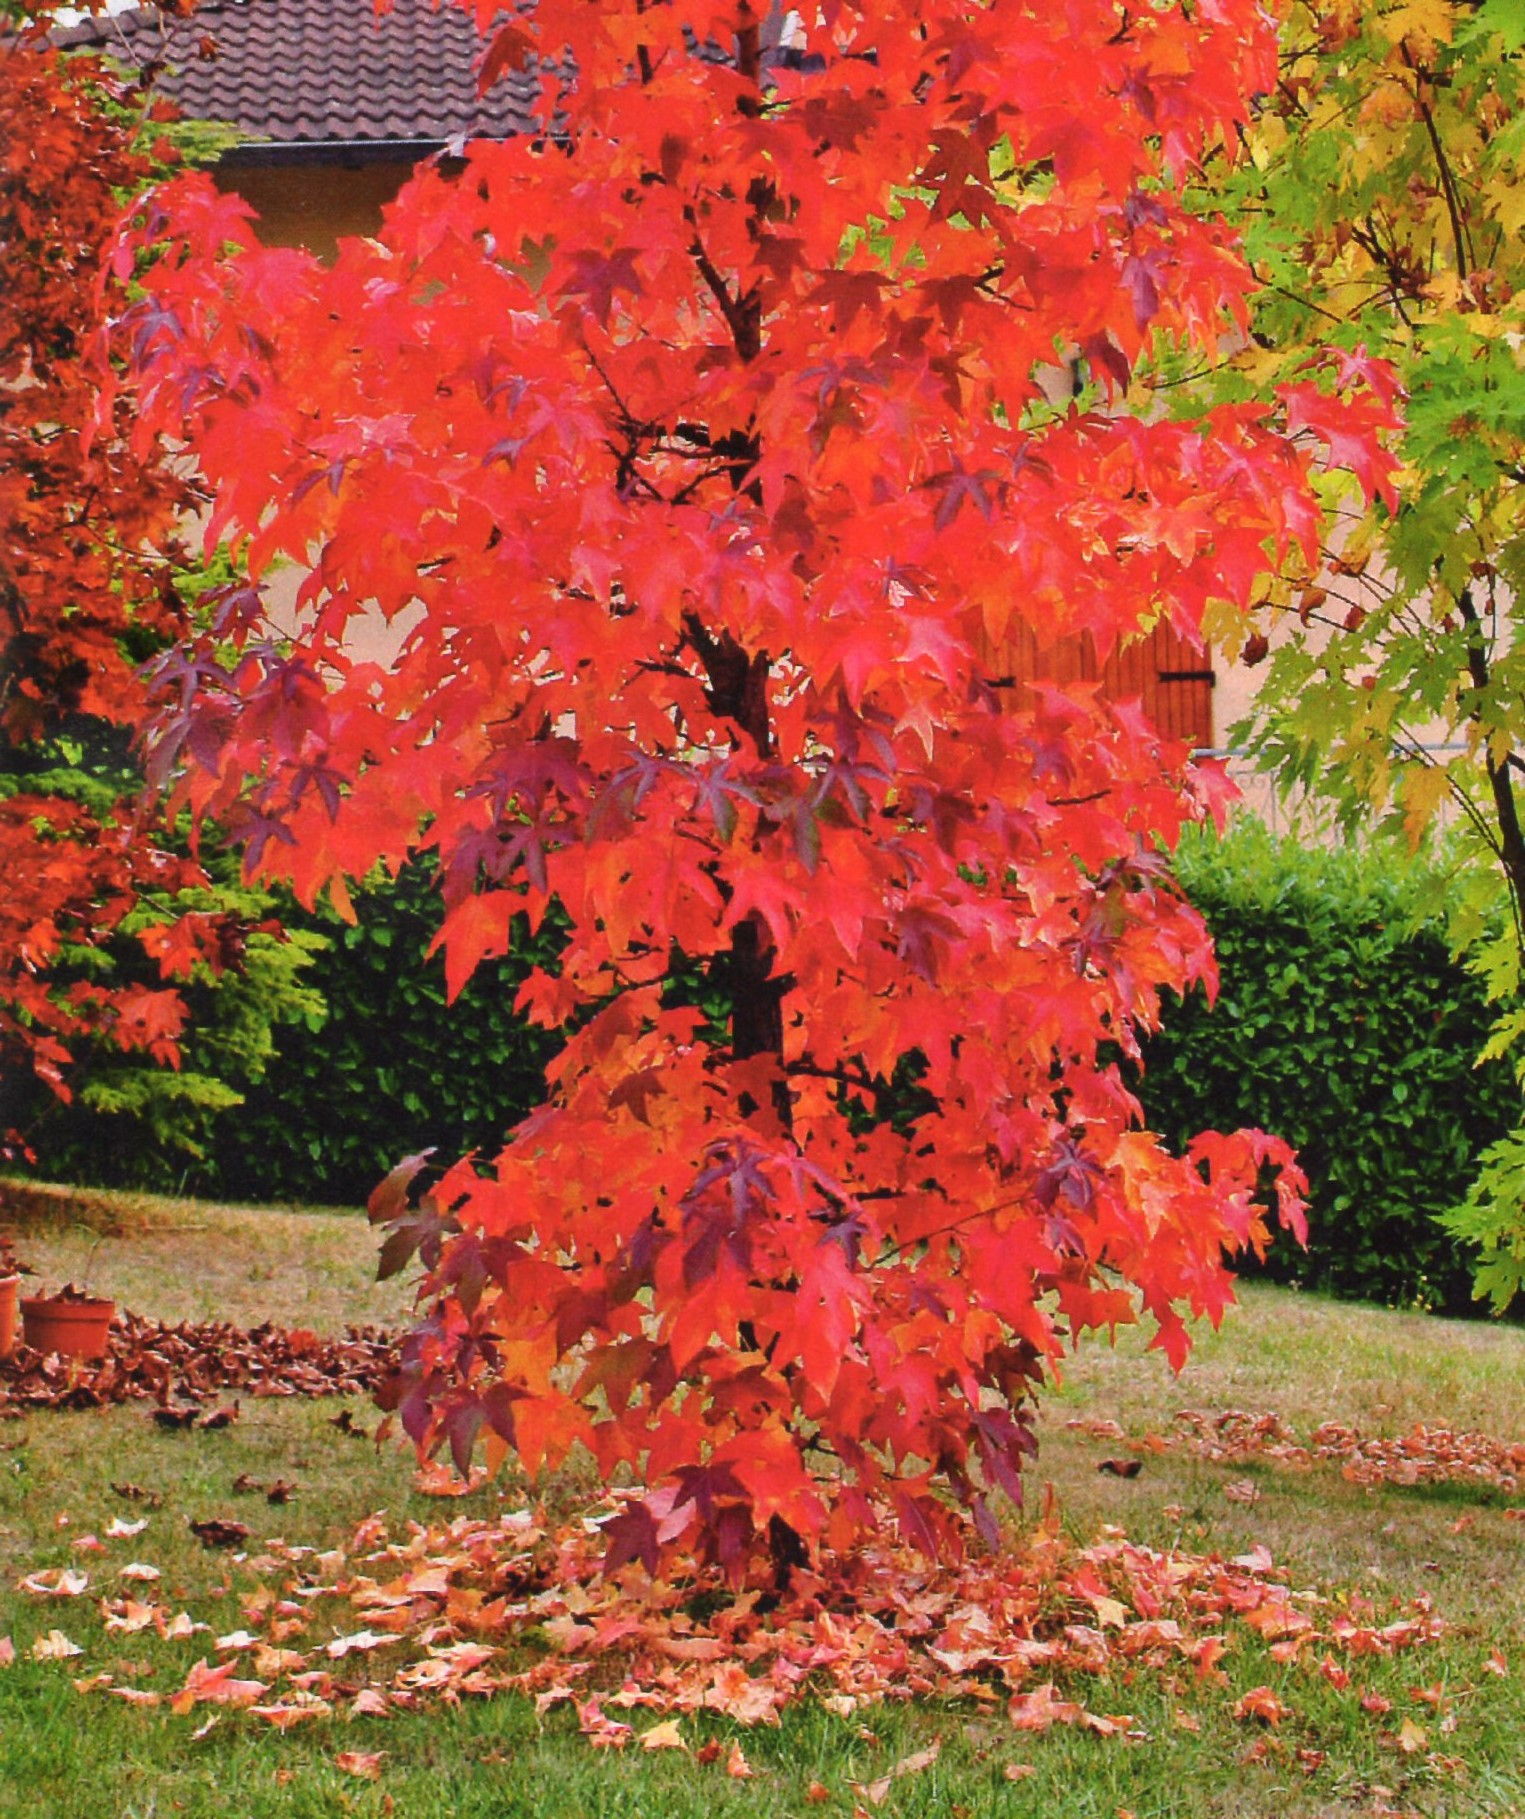 Pianta Foglie Rosse E Verdi foglie rosse fuoco - vita trentina